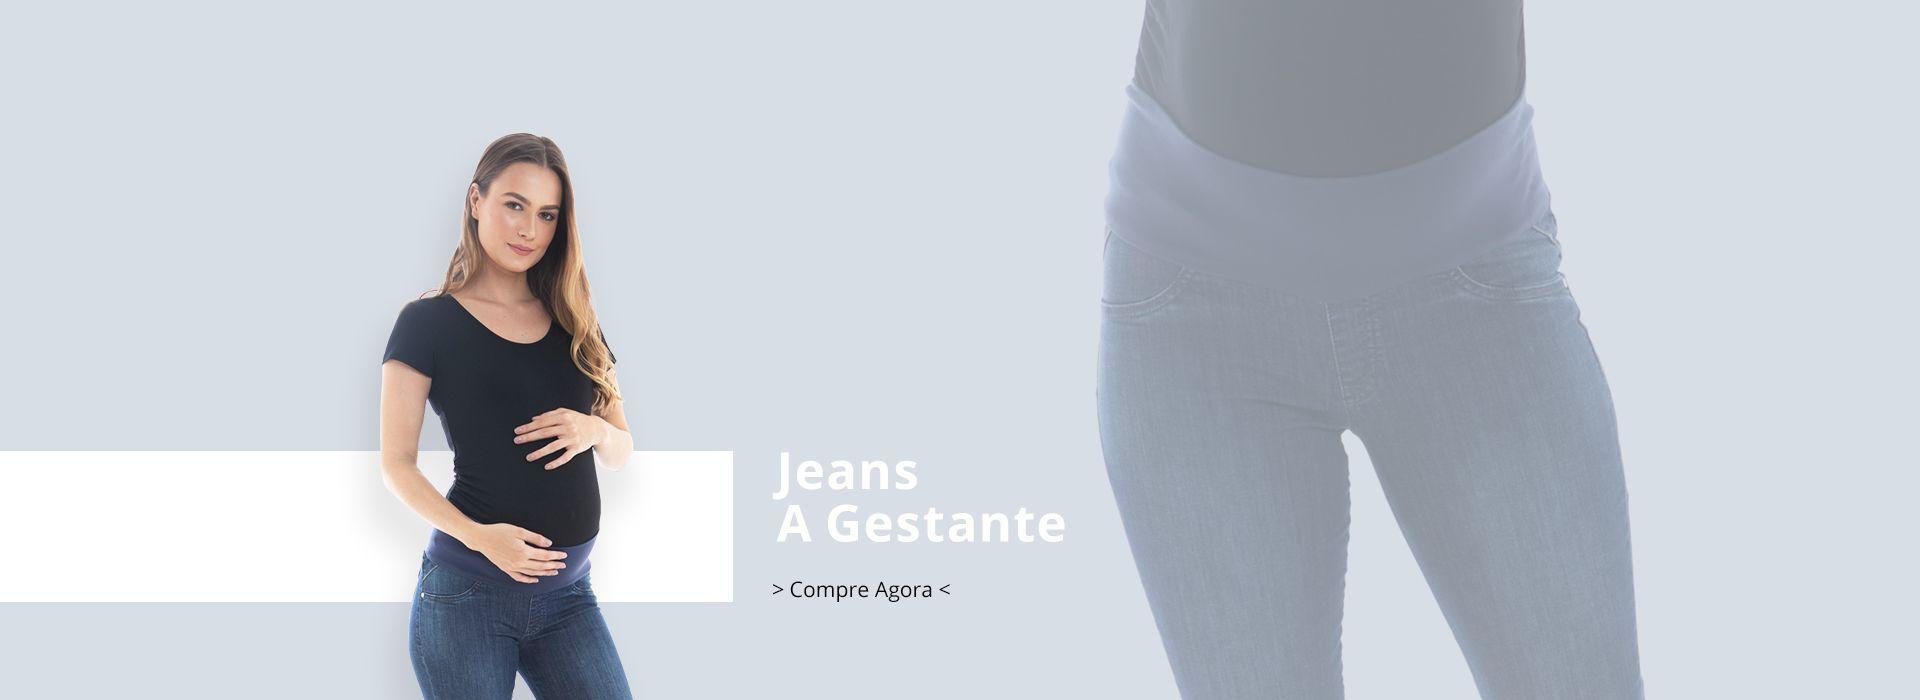 Jeans A Gestante